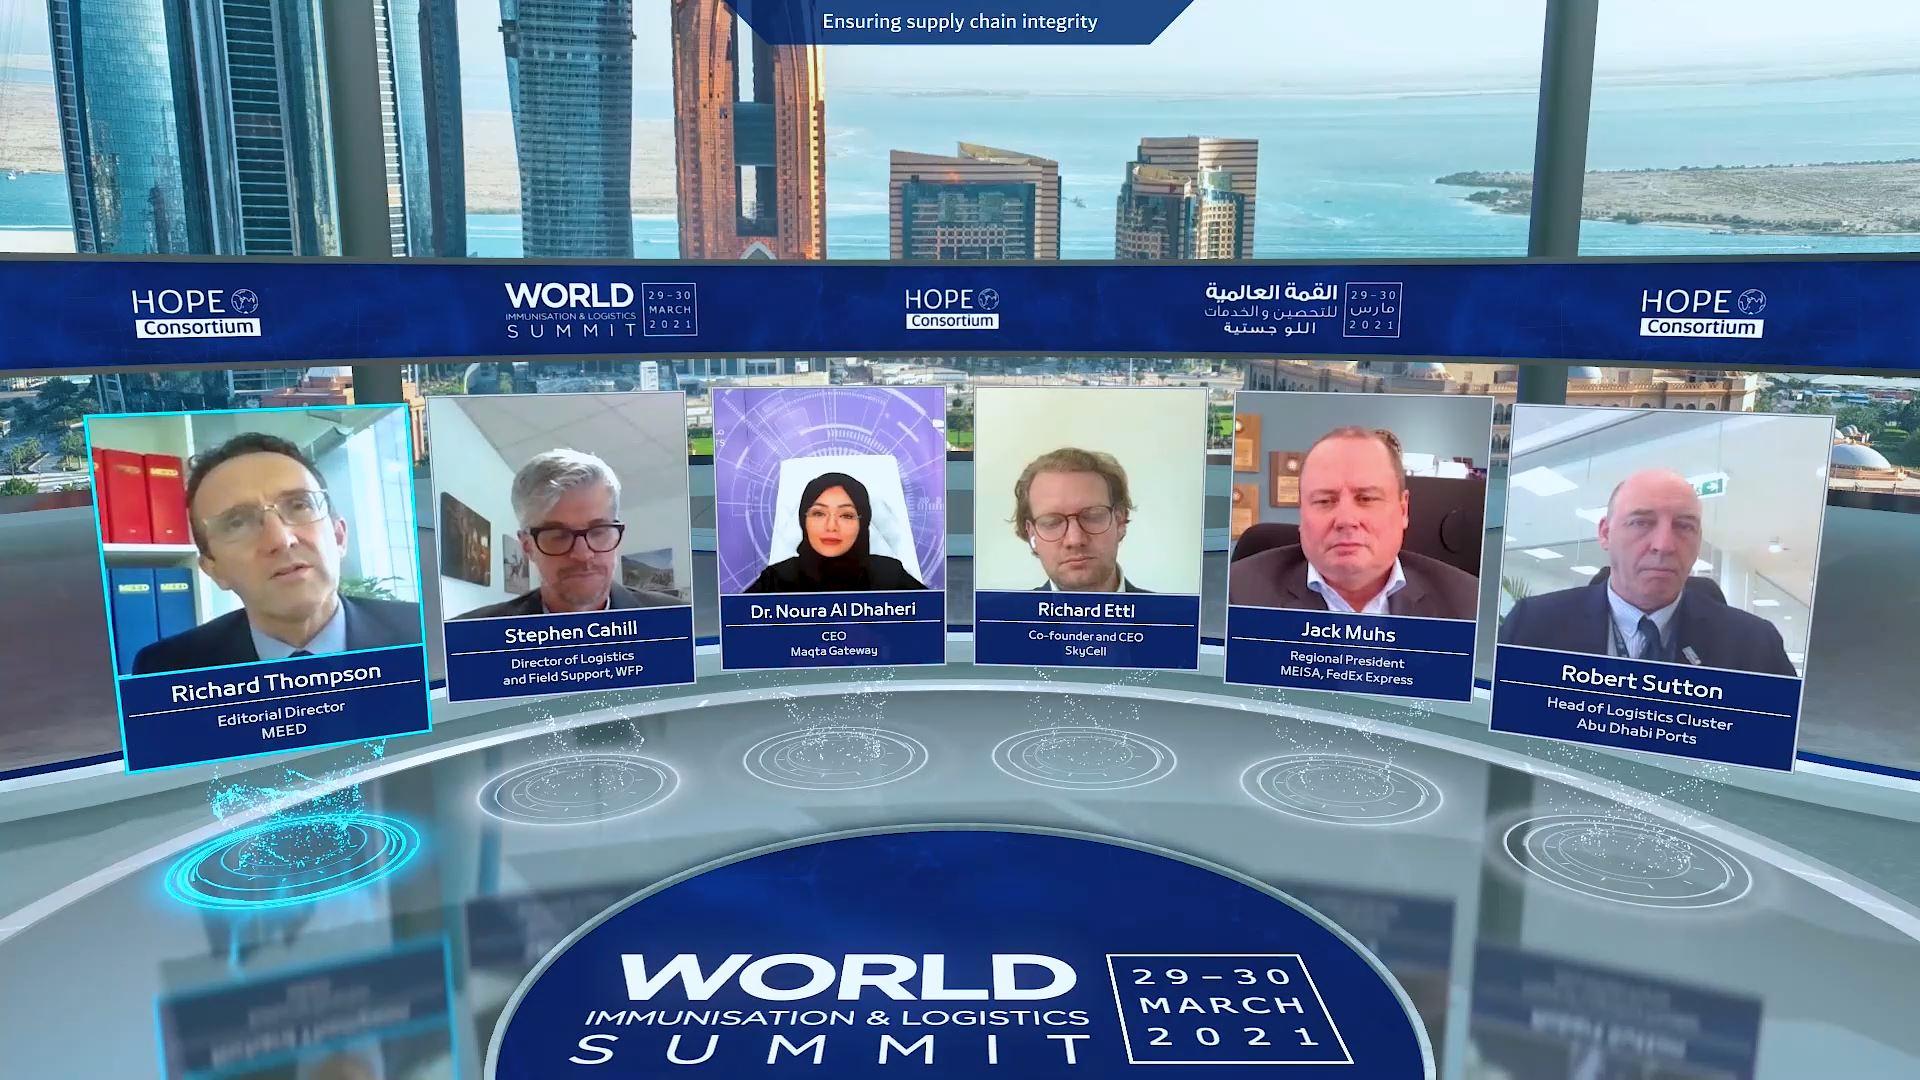 hope consortium world immunization and logistics summit virtual exhibition panel discussion